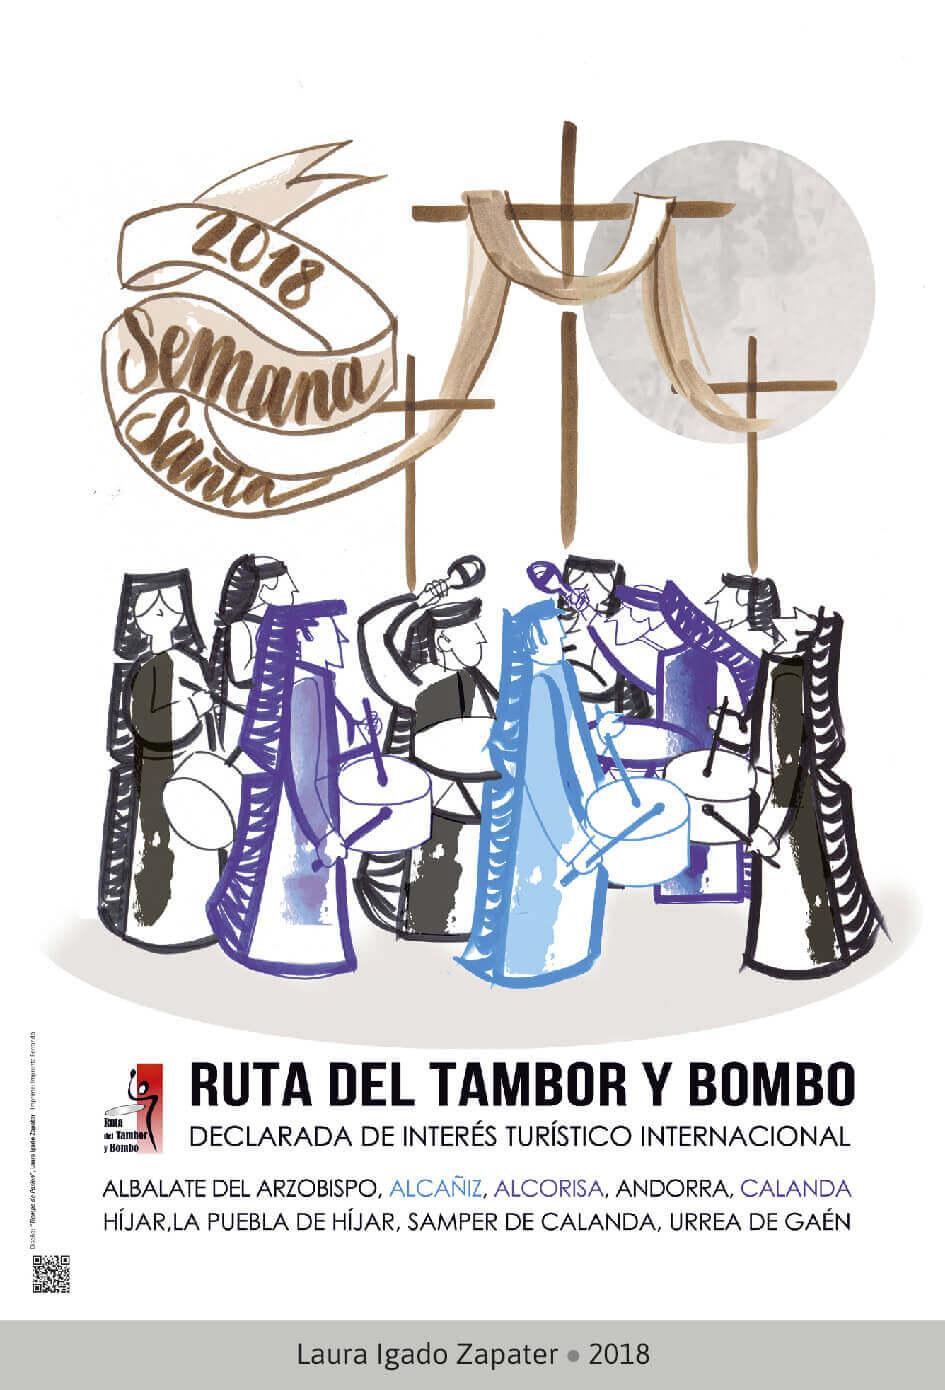 Cartel Ganador Ruta del Tambor y Bombo. Semana Santa 2018